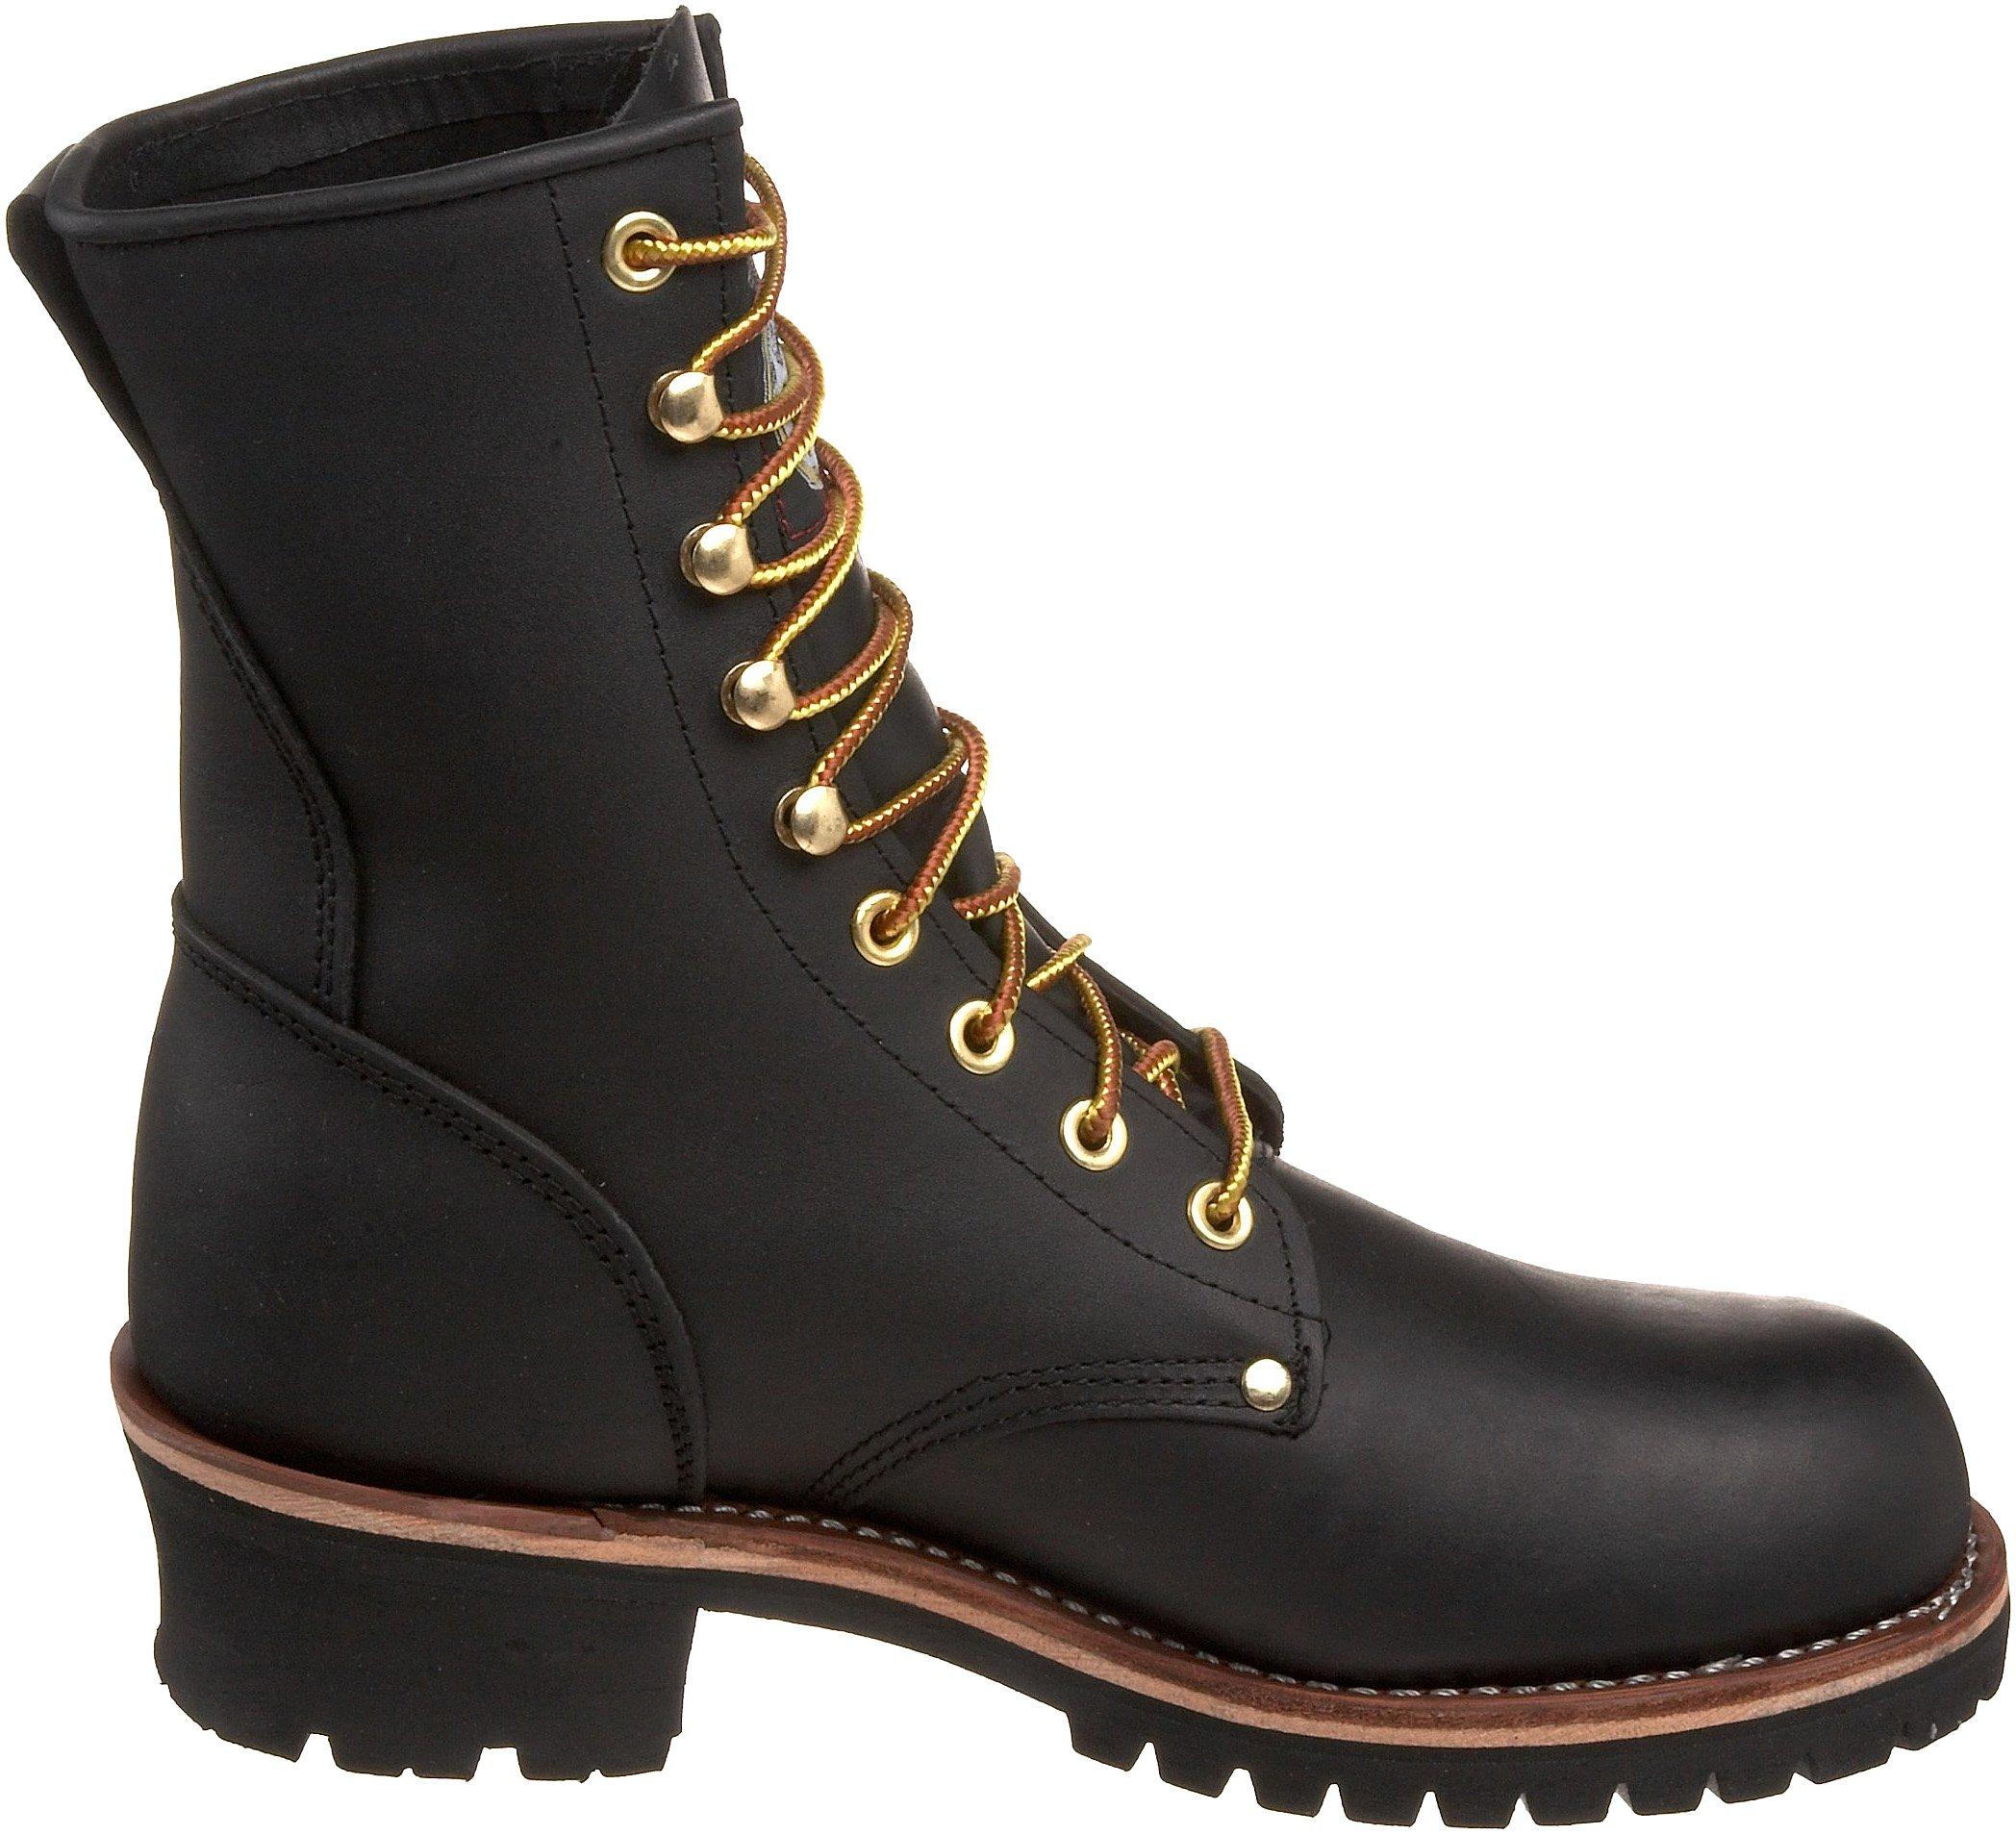 Georgia Boot Men's Logger 8'' Black Non Steel,Oily Black,5 M US by Georgia Boot (Image #6)